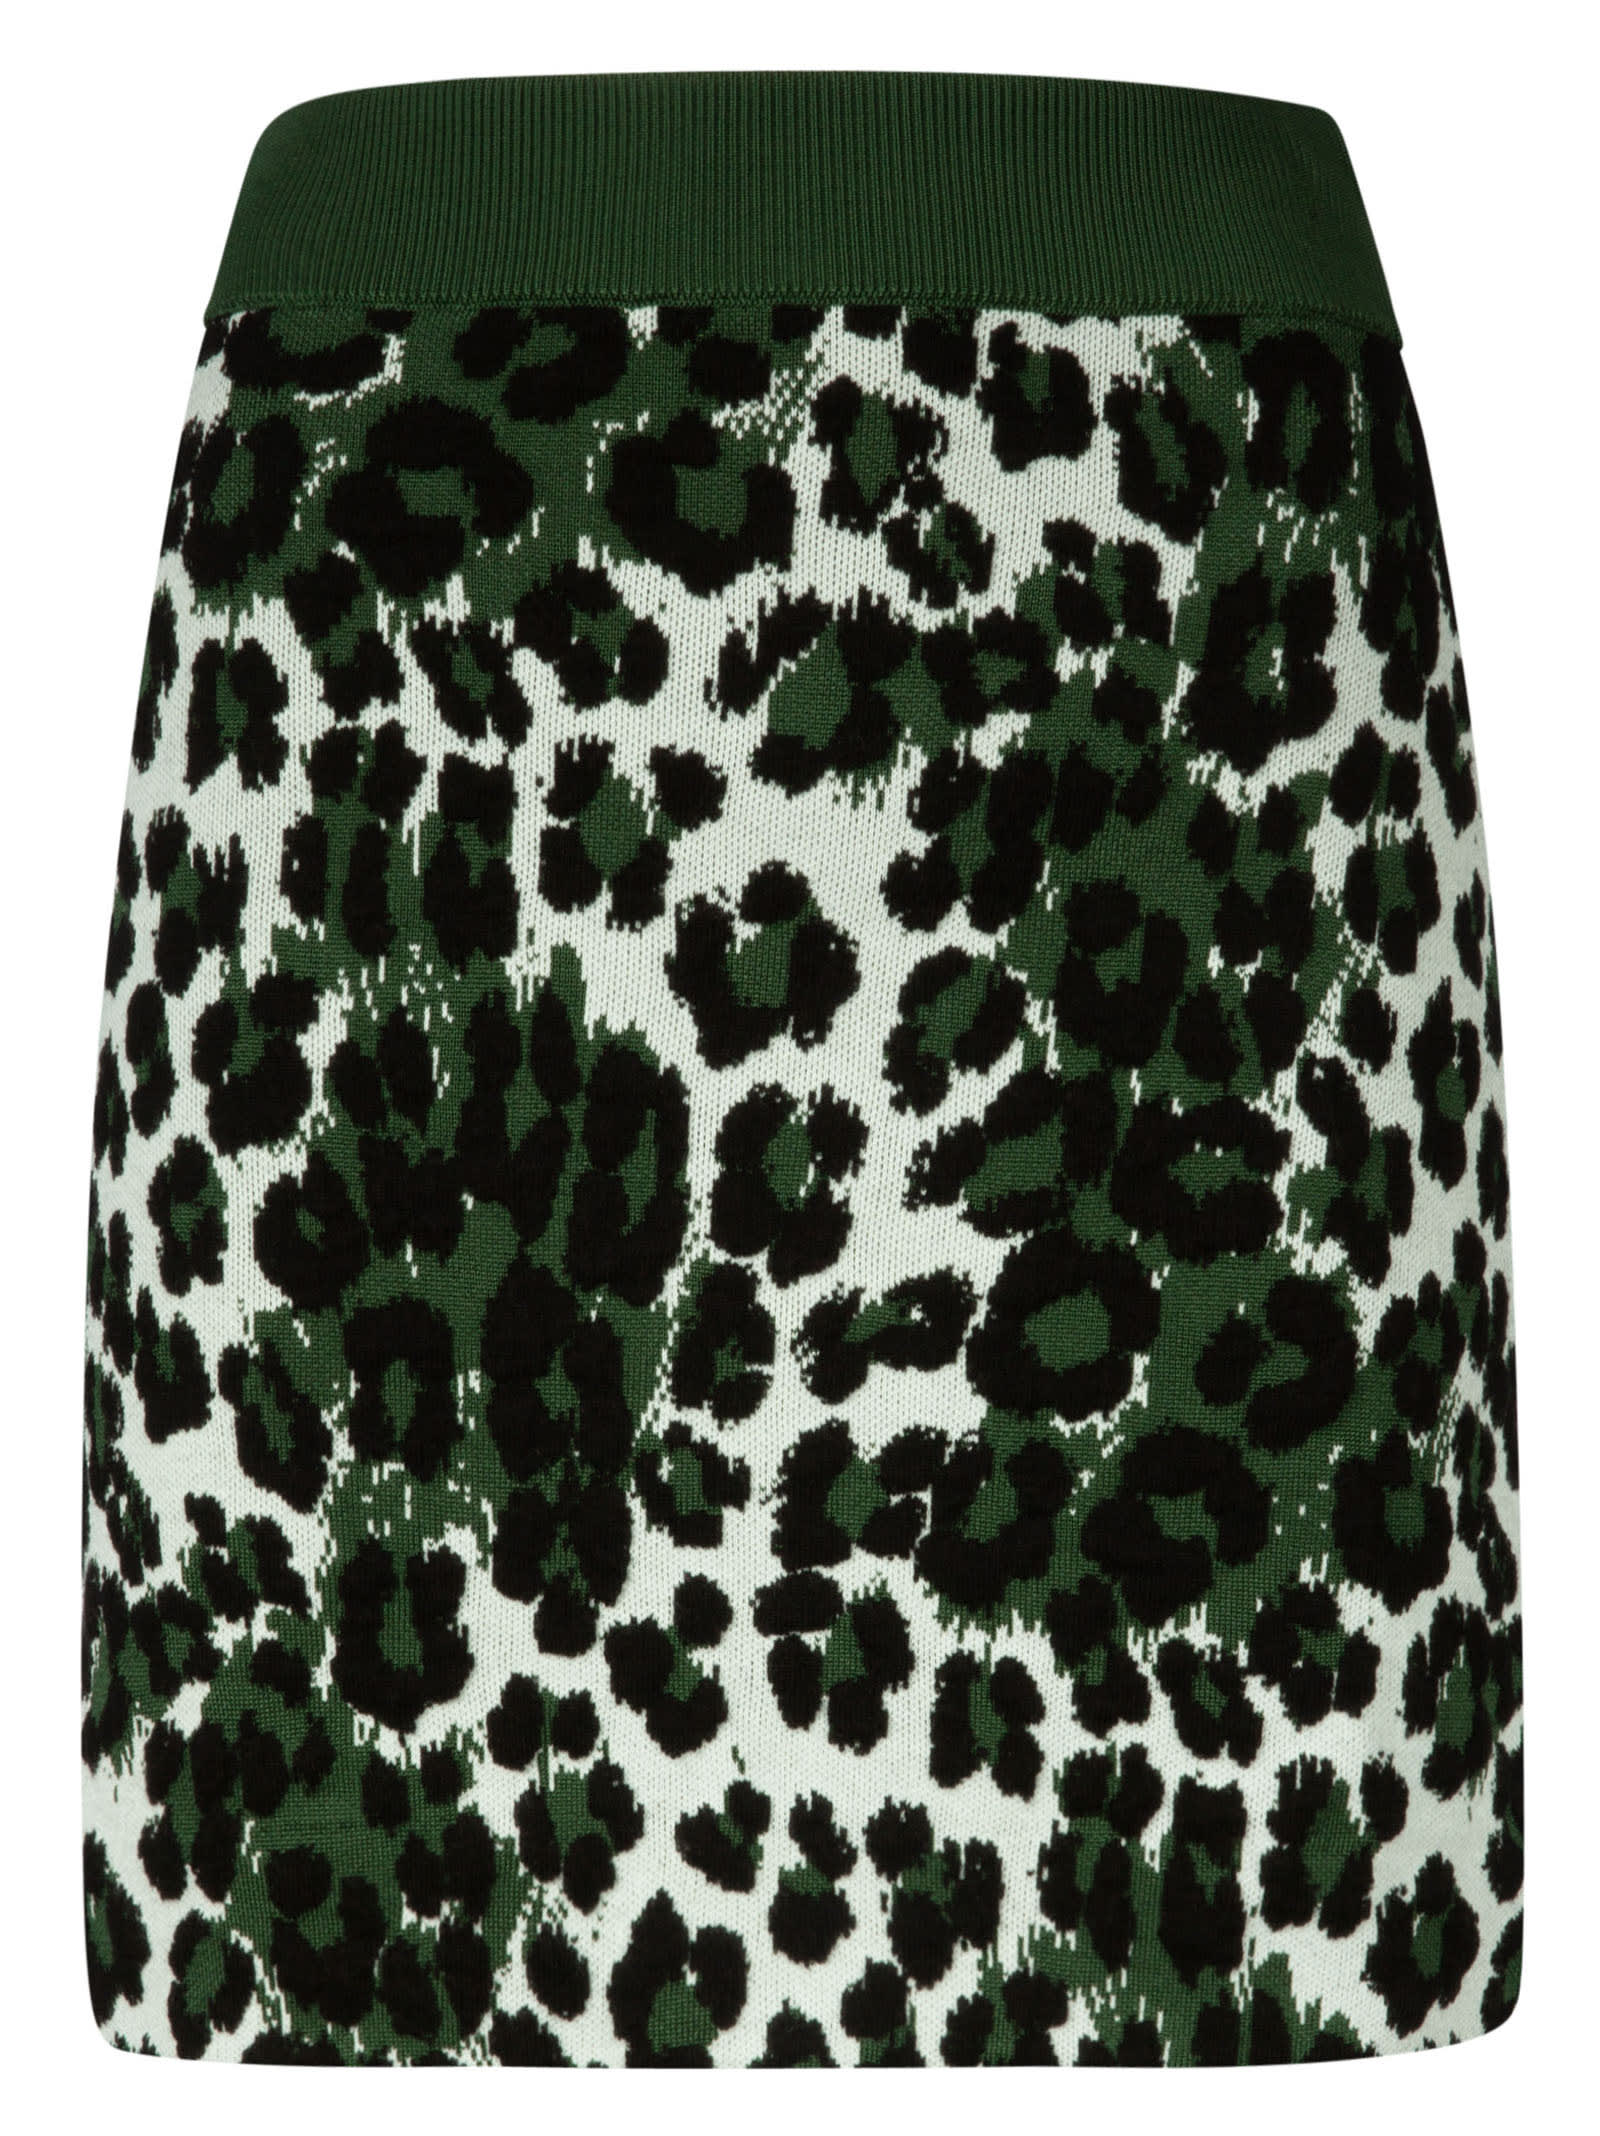 Kenzo Leopard Jacquard Skirt